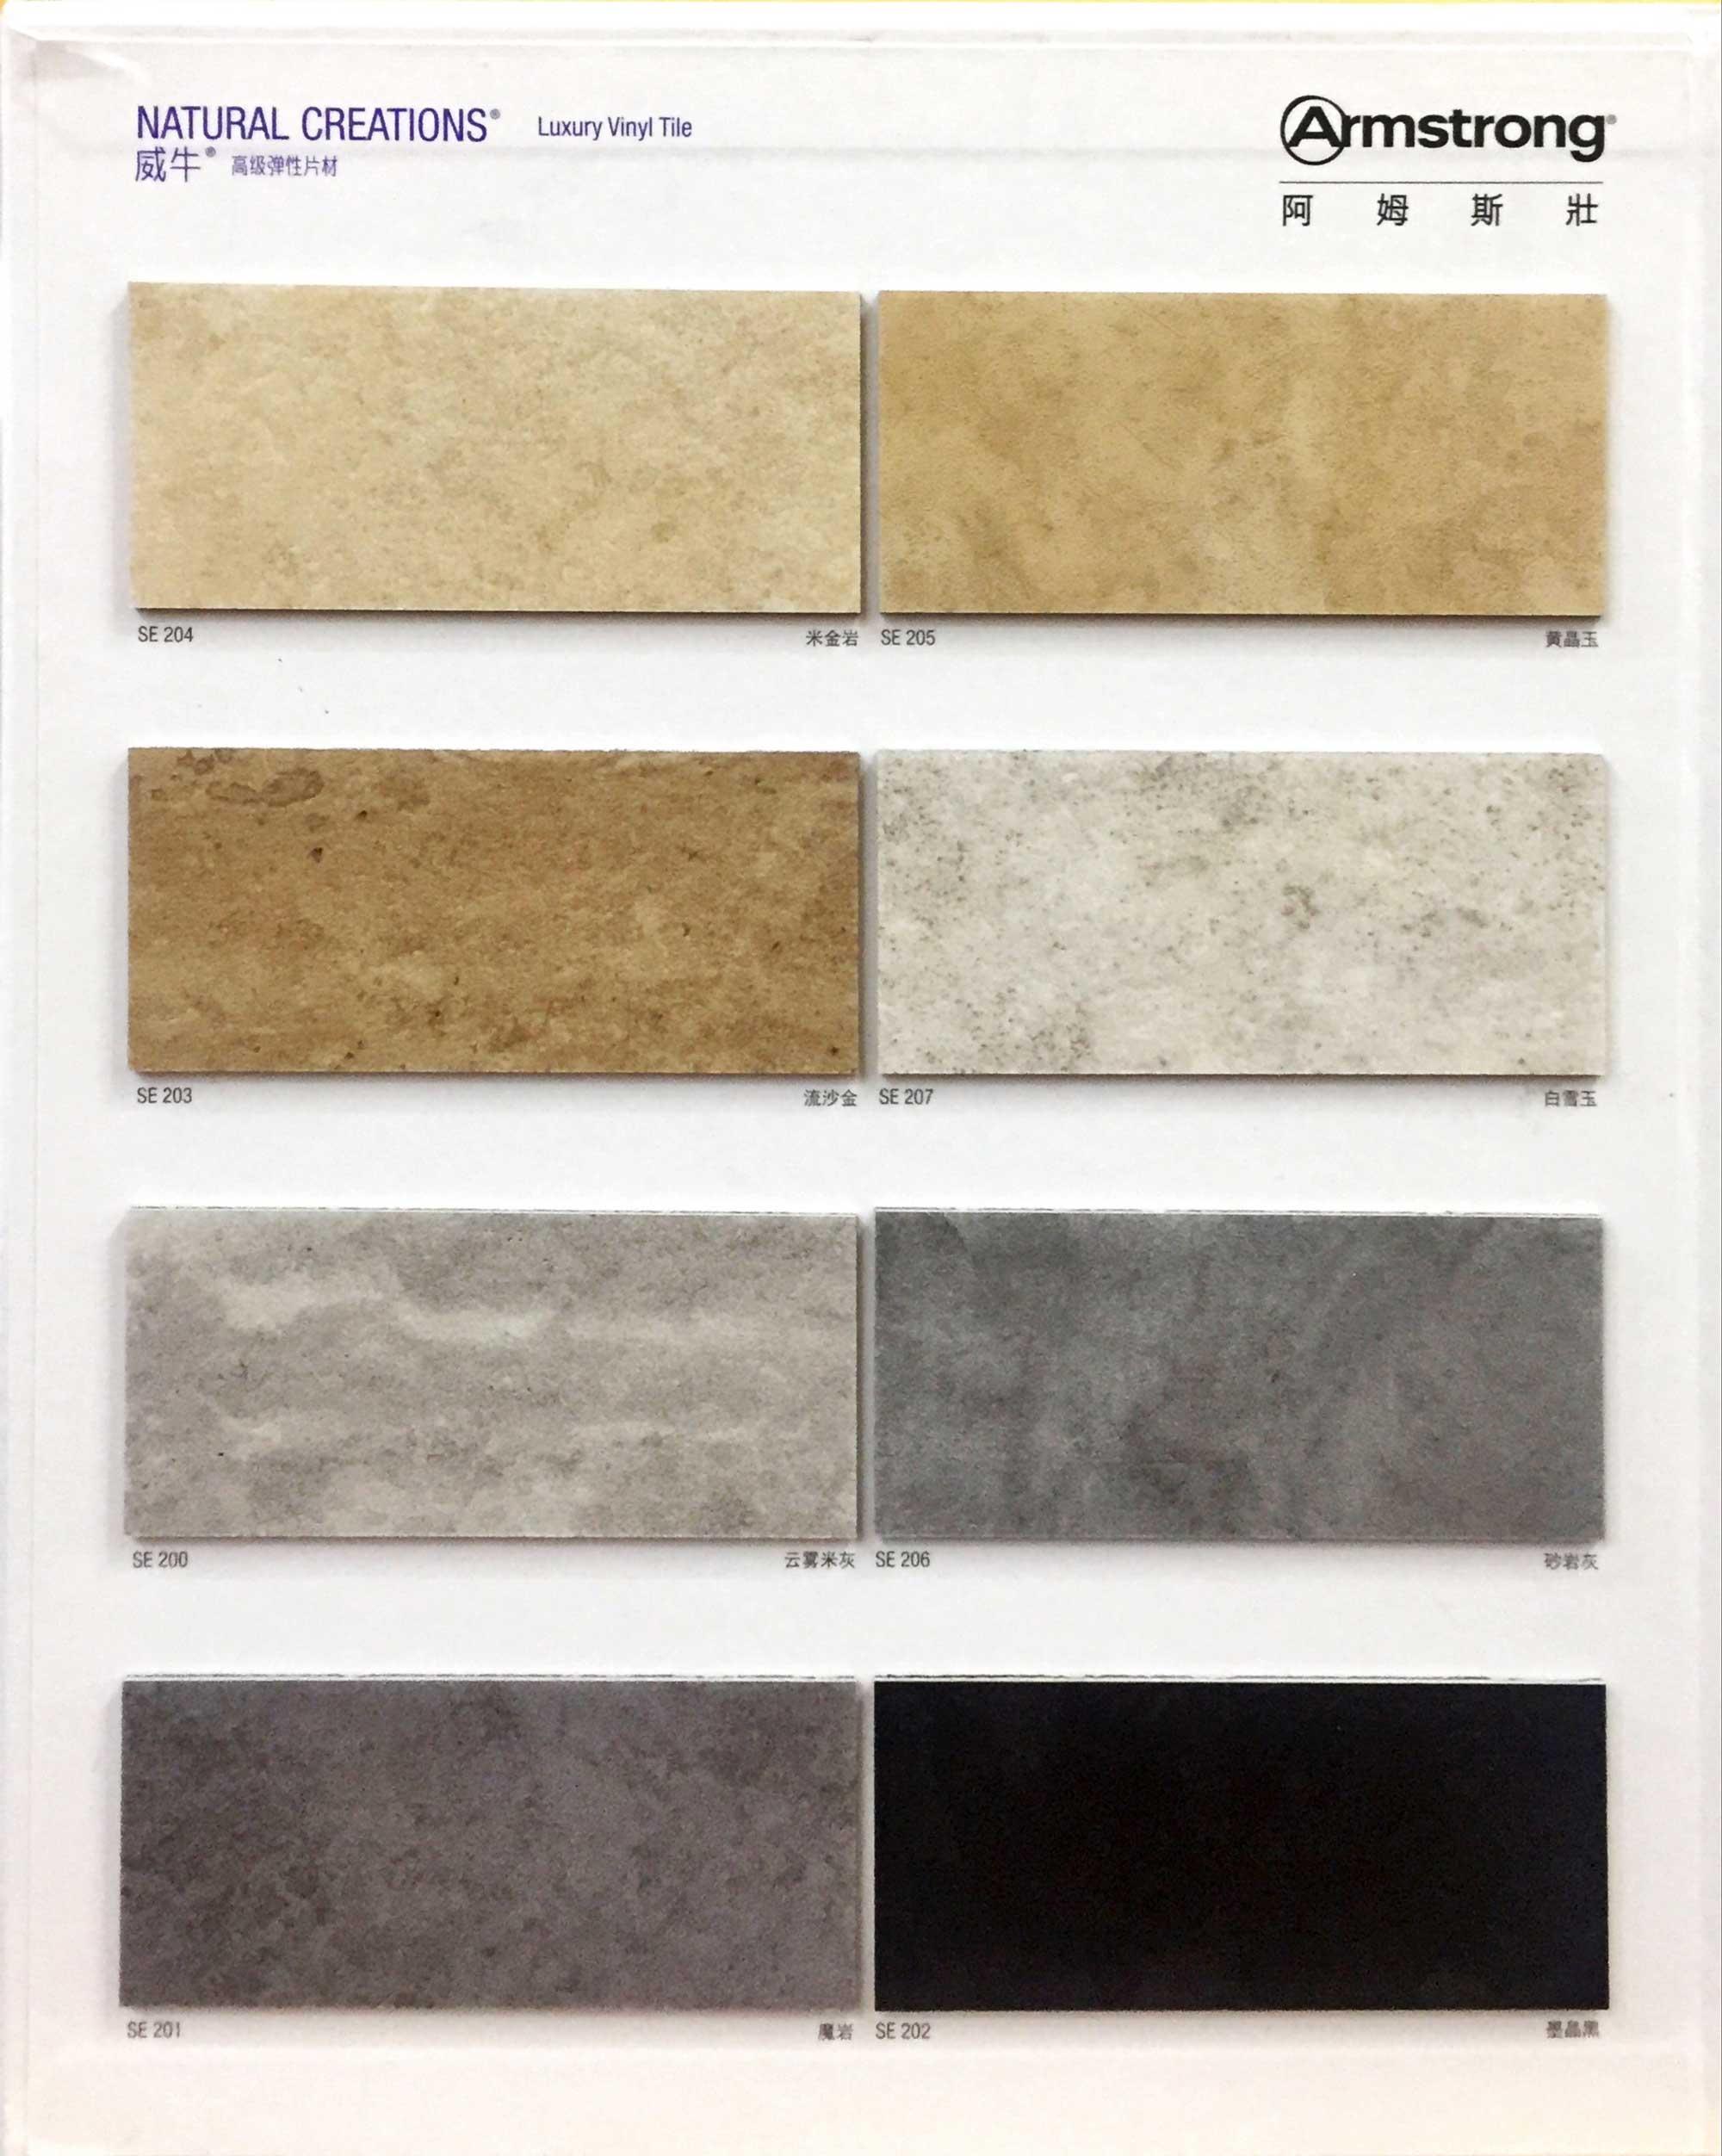 Armstrong Natural Creations Takyin Vinyl Tile Flooring Specialist Macau